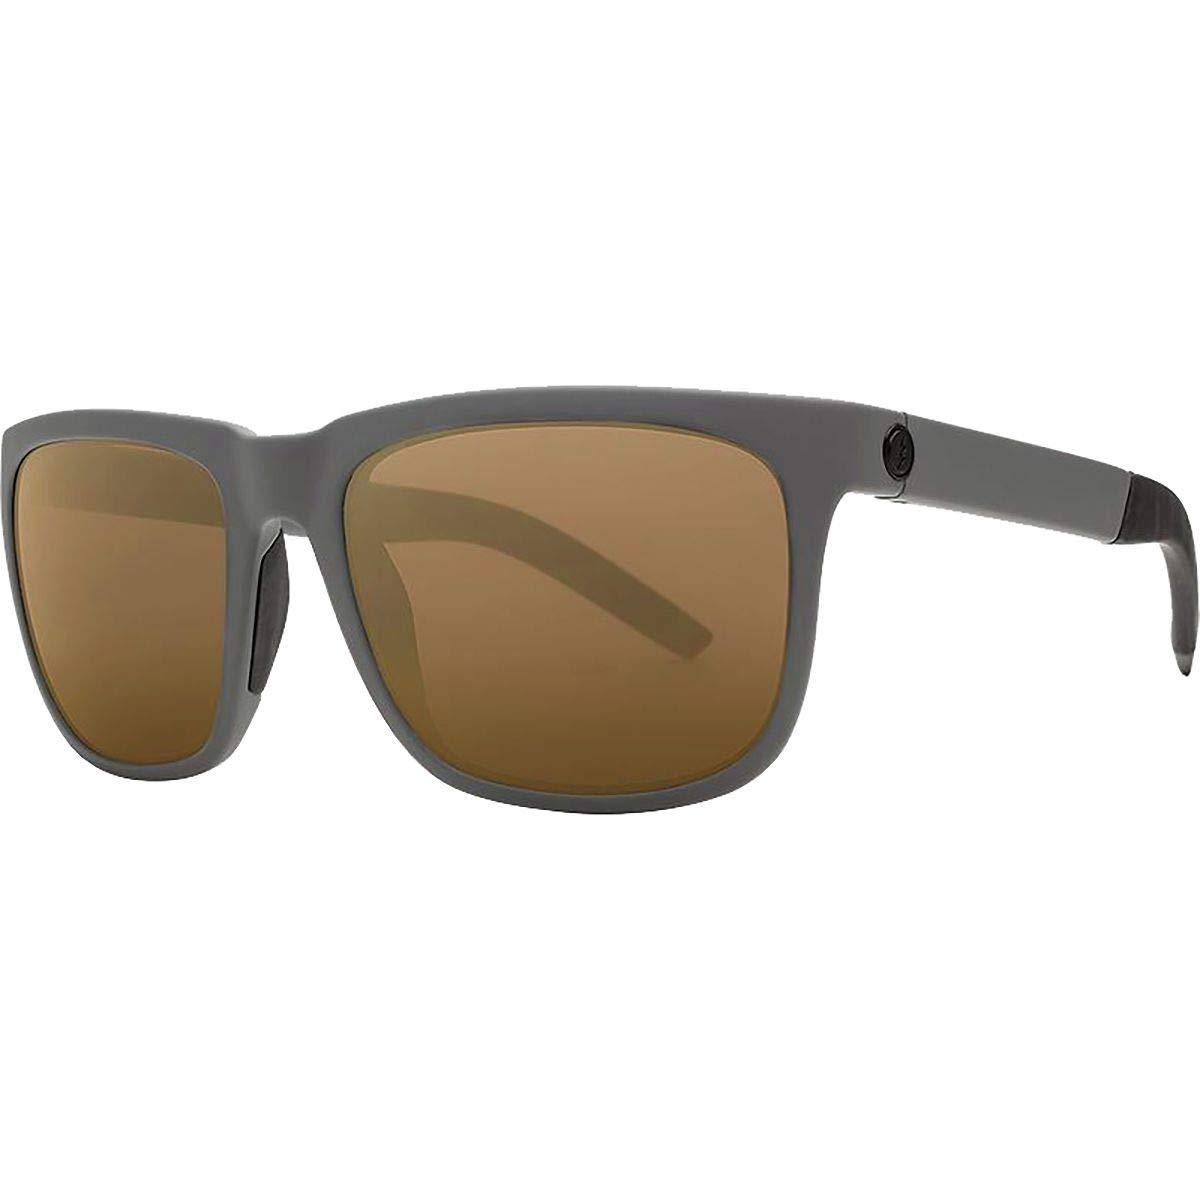 Electric Eyewear Unisex Knoxville S